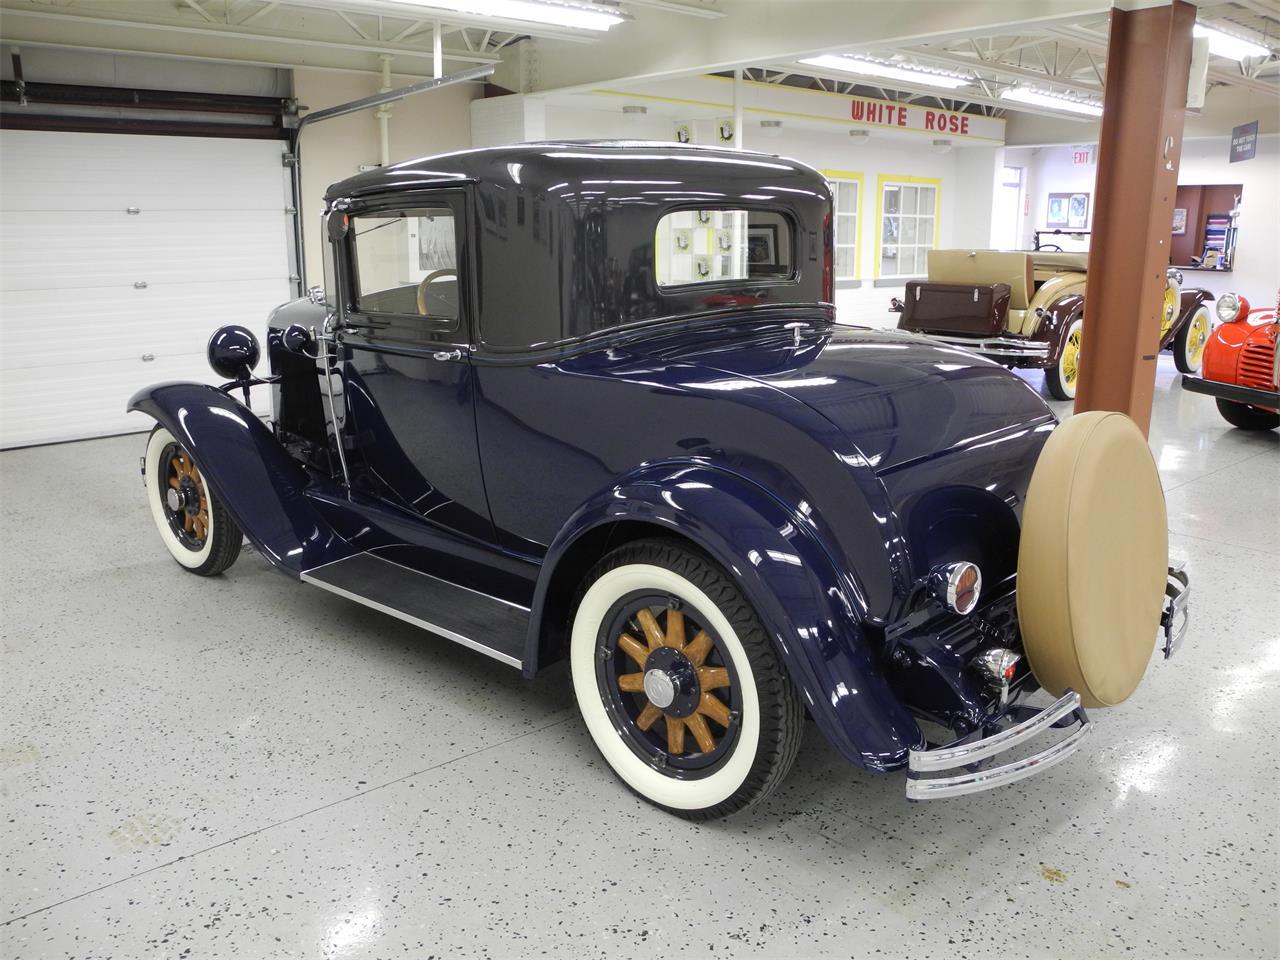 Sudbury Car Dealerships >> 1930 Buick Coupe for Sale   ClassicCars.com   CC-1039778